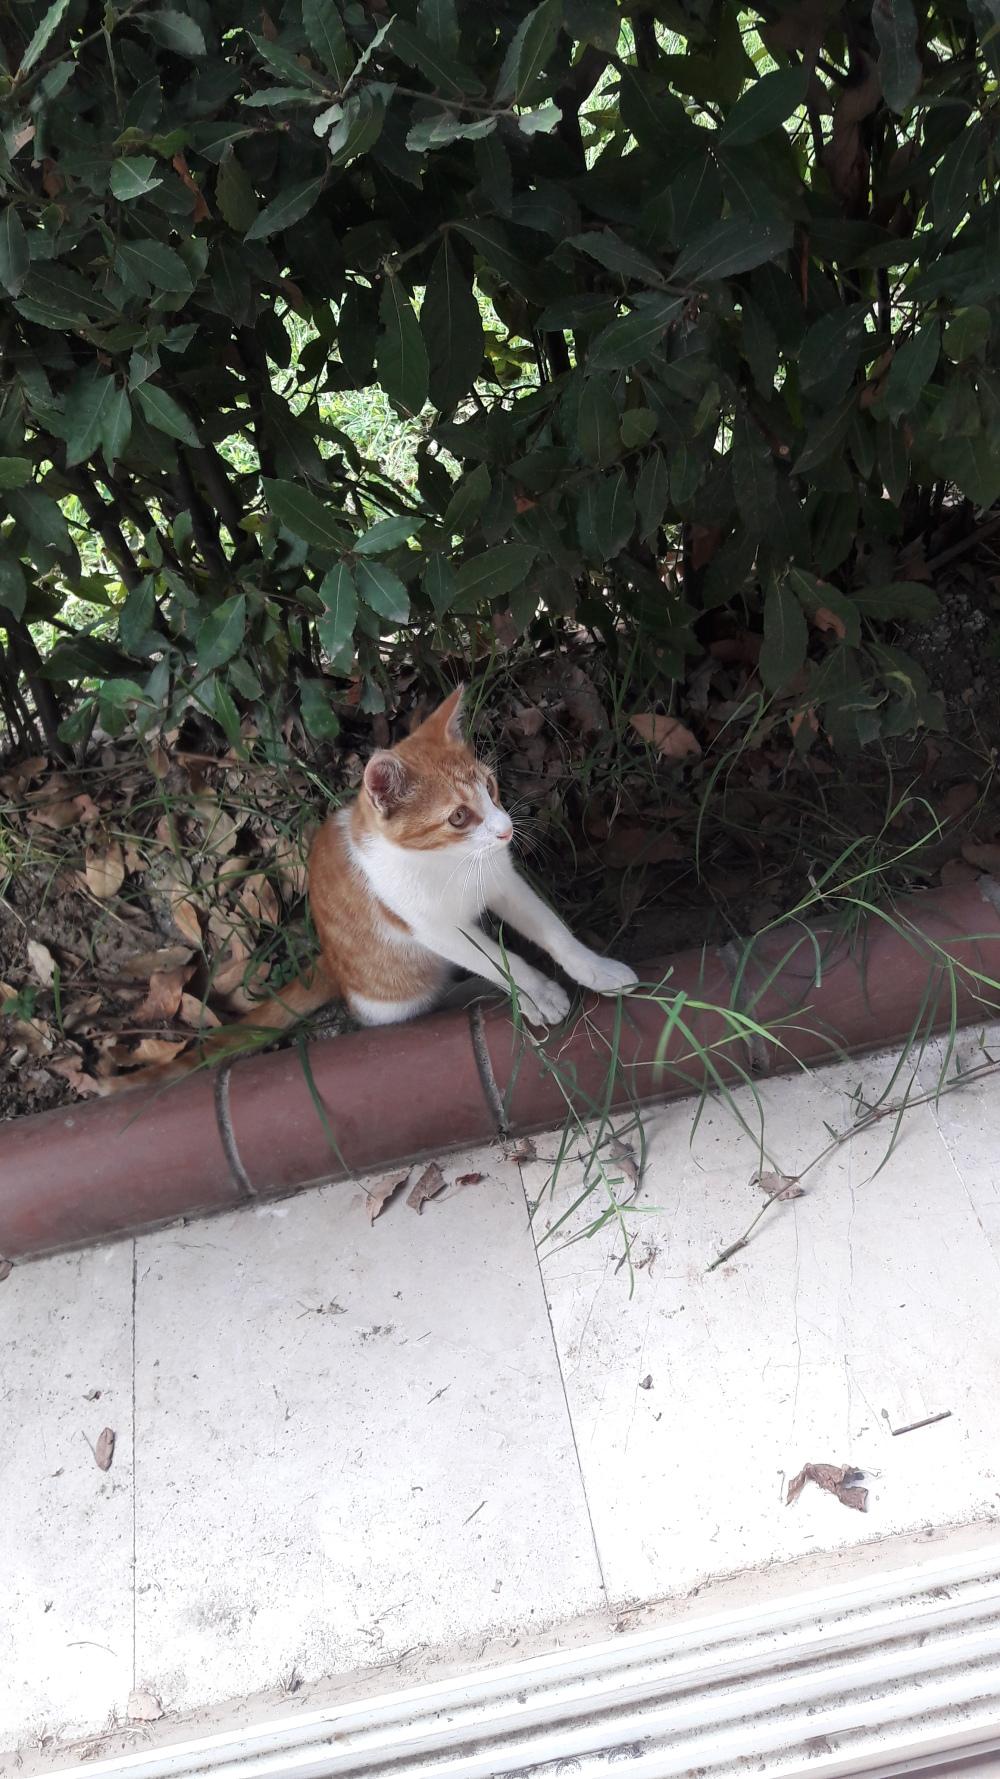 Here's a cute kitty